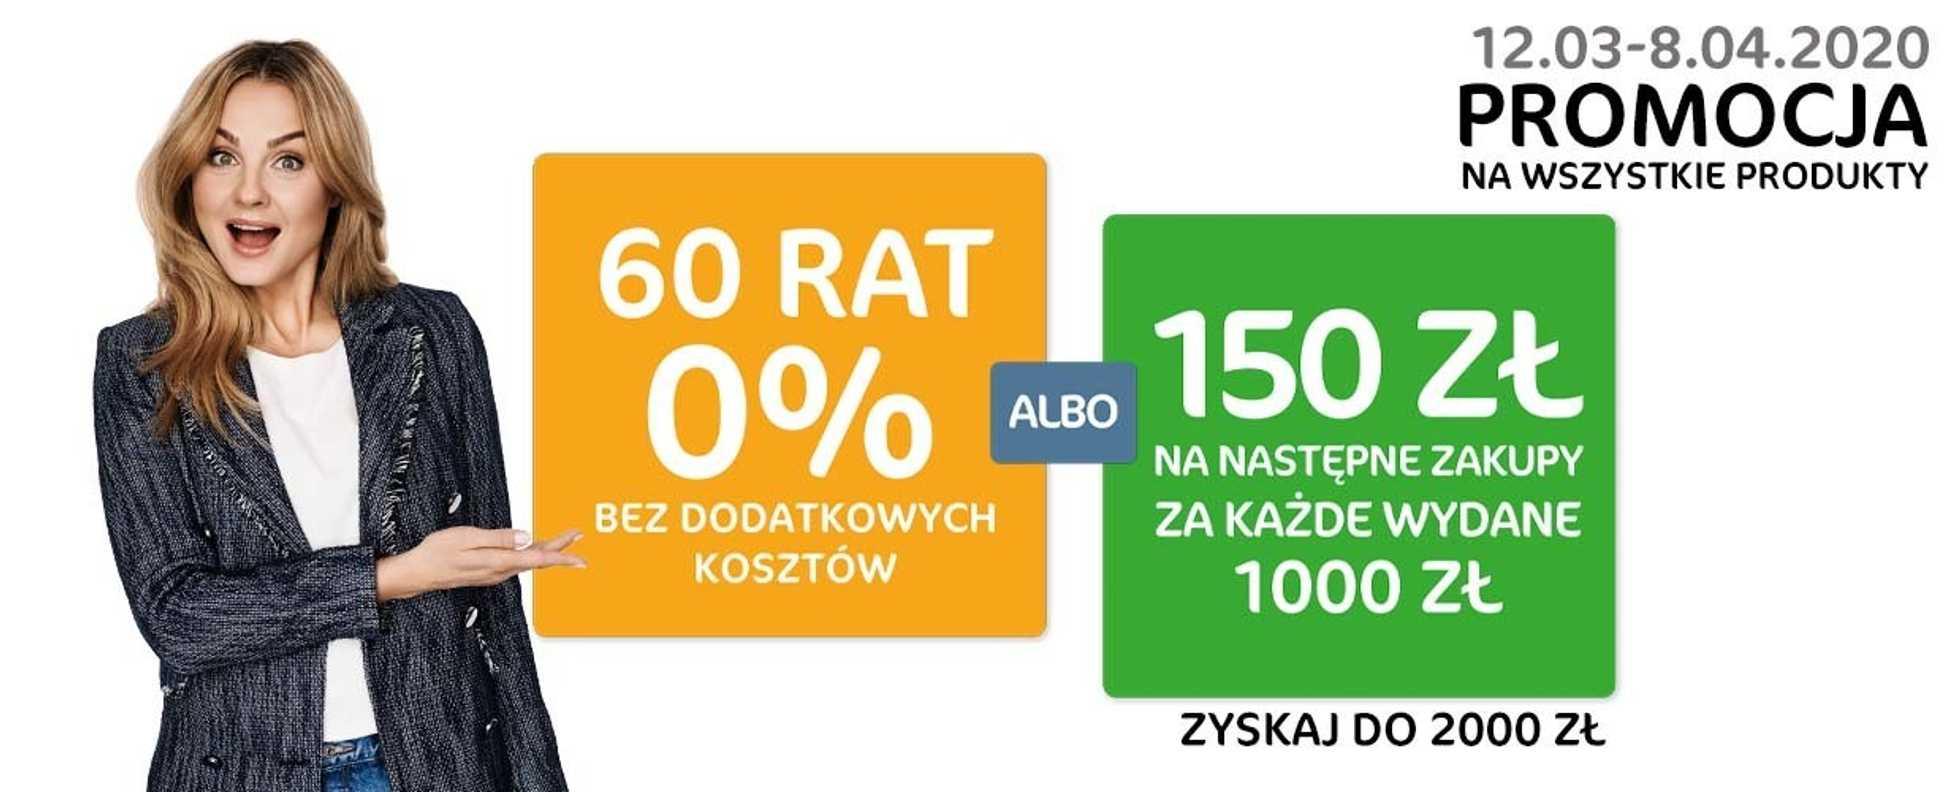 Agata Meble - gazetka promocyjna ważna od 12.03.2020 do 08.04.2020 - strona 1.